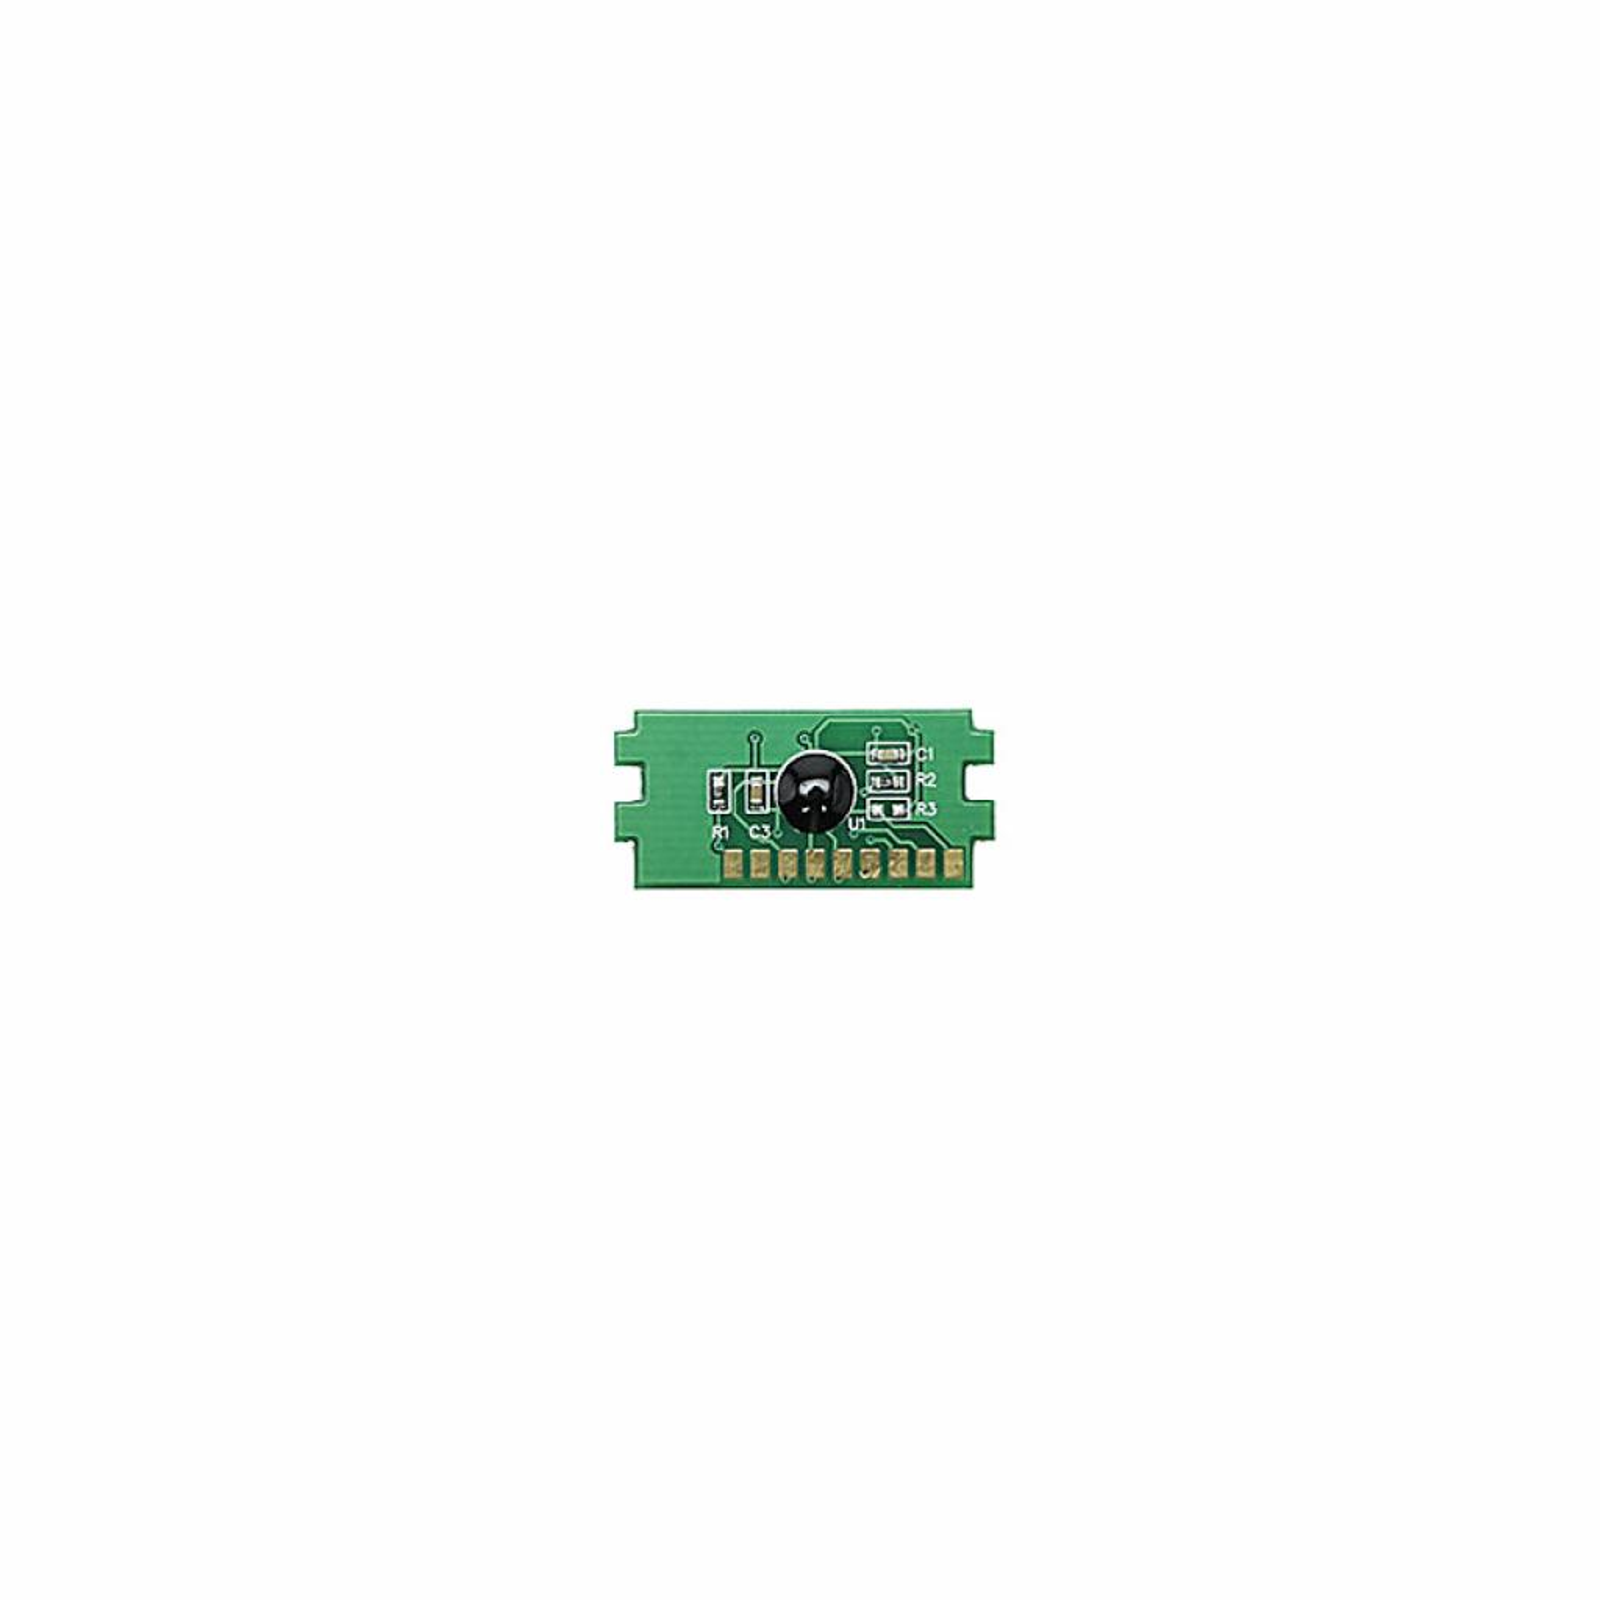 Чип для картриджа Kyocera TK-5160K (EU) 16k black Static Control (TK5160CP-KEU)